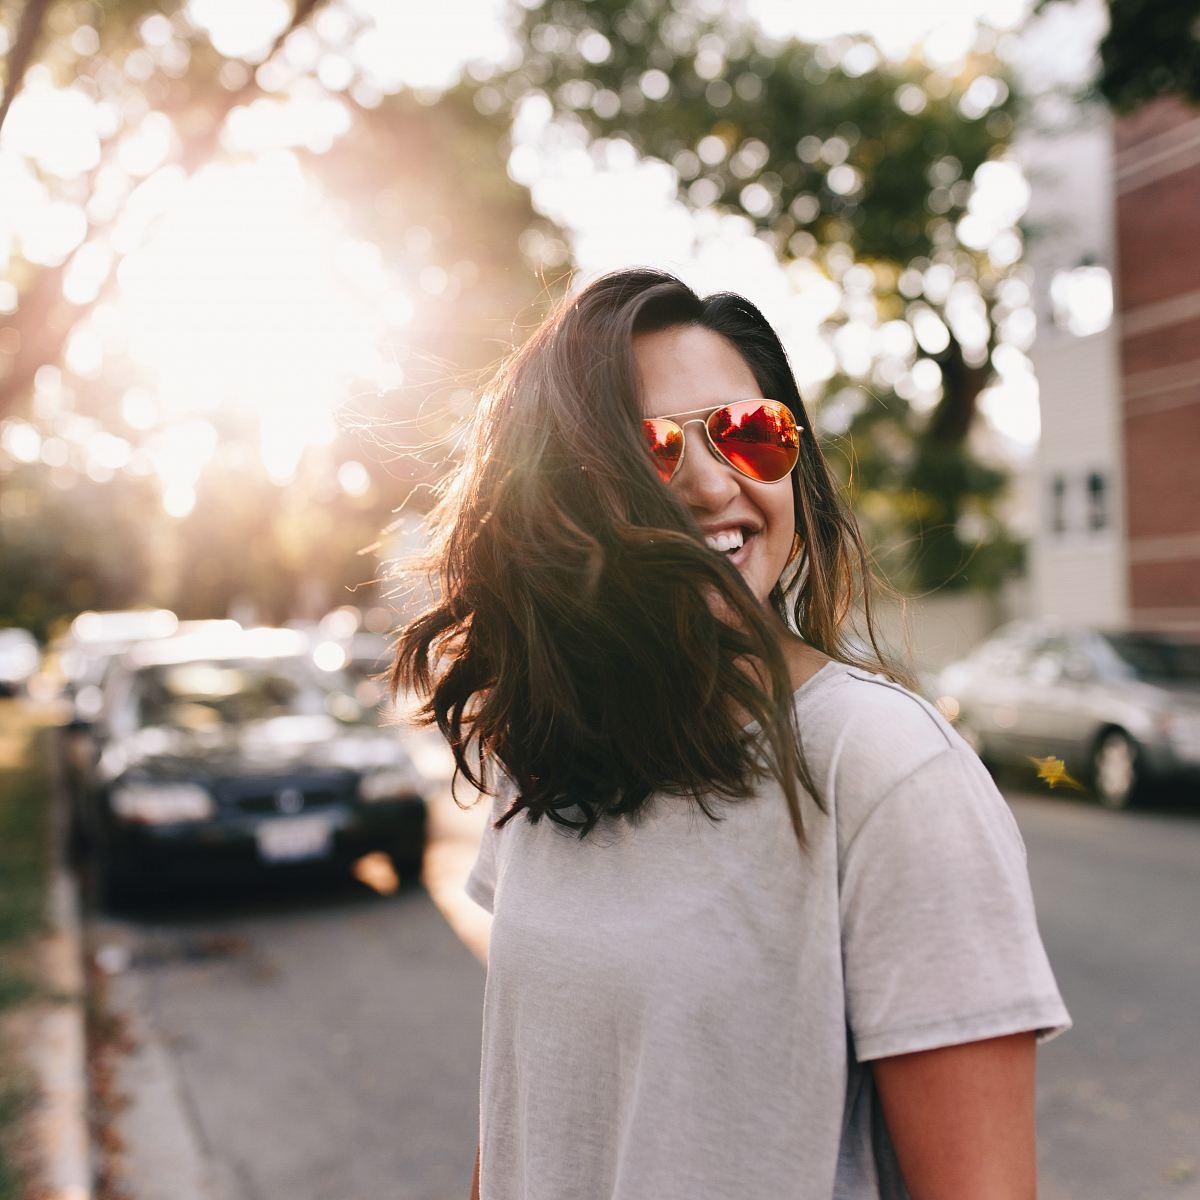 stock photos free  of woman wearing white T-shirt smiling